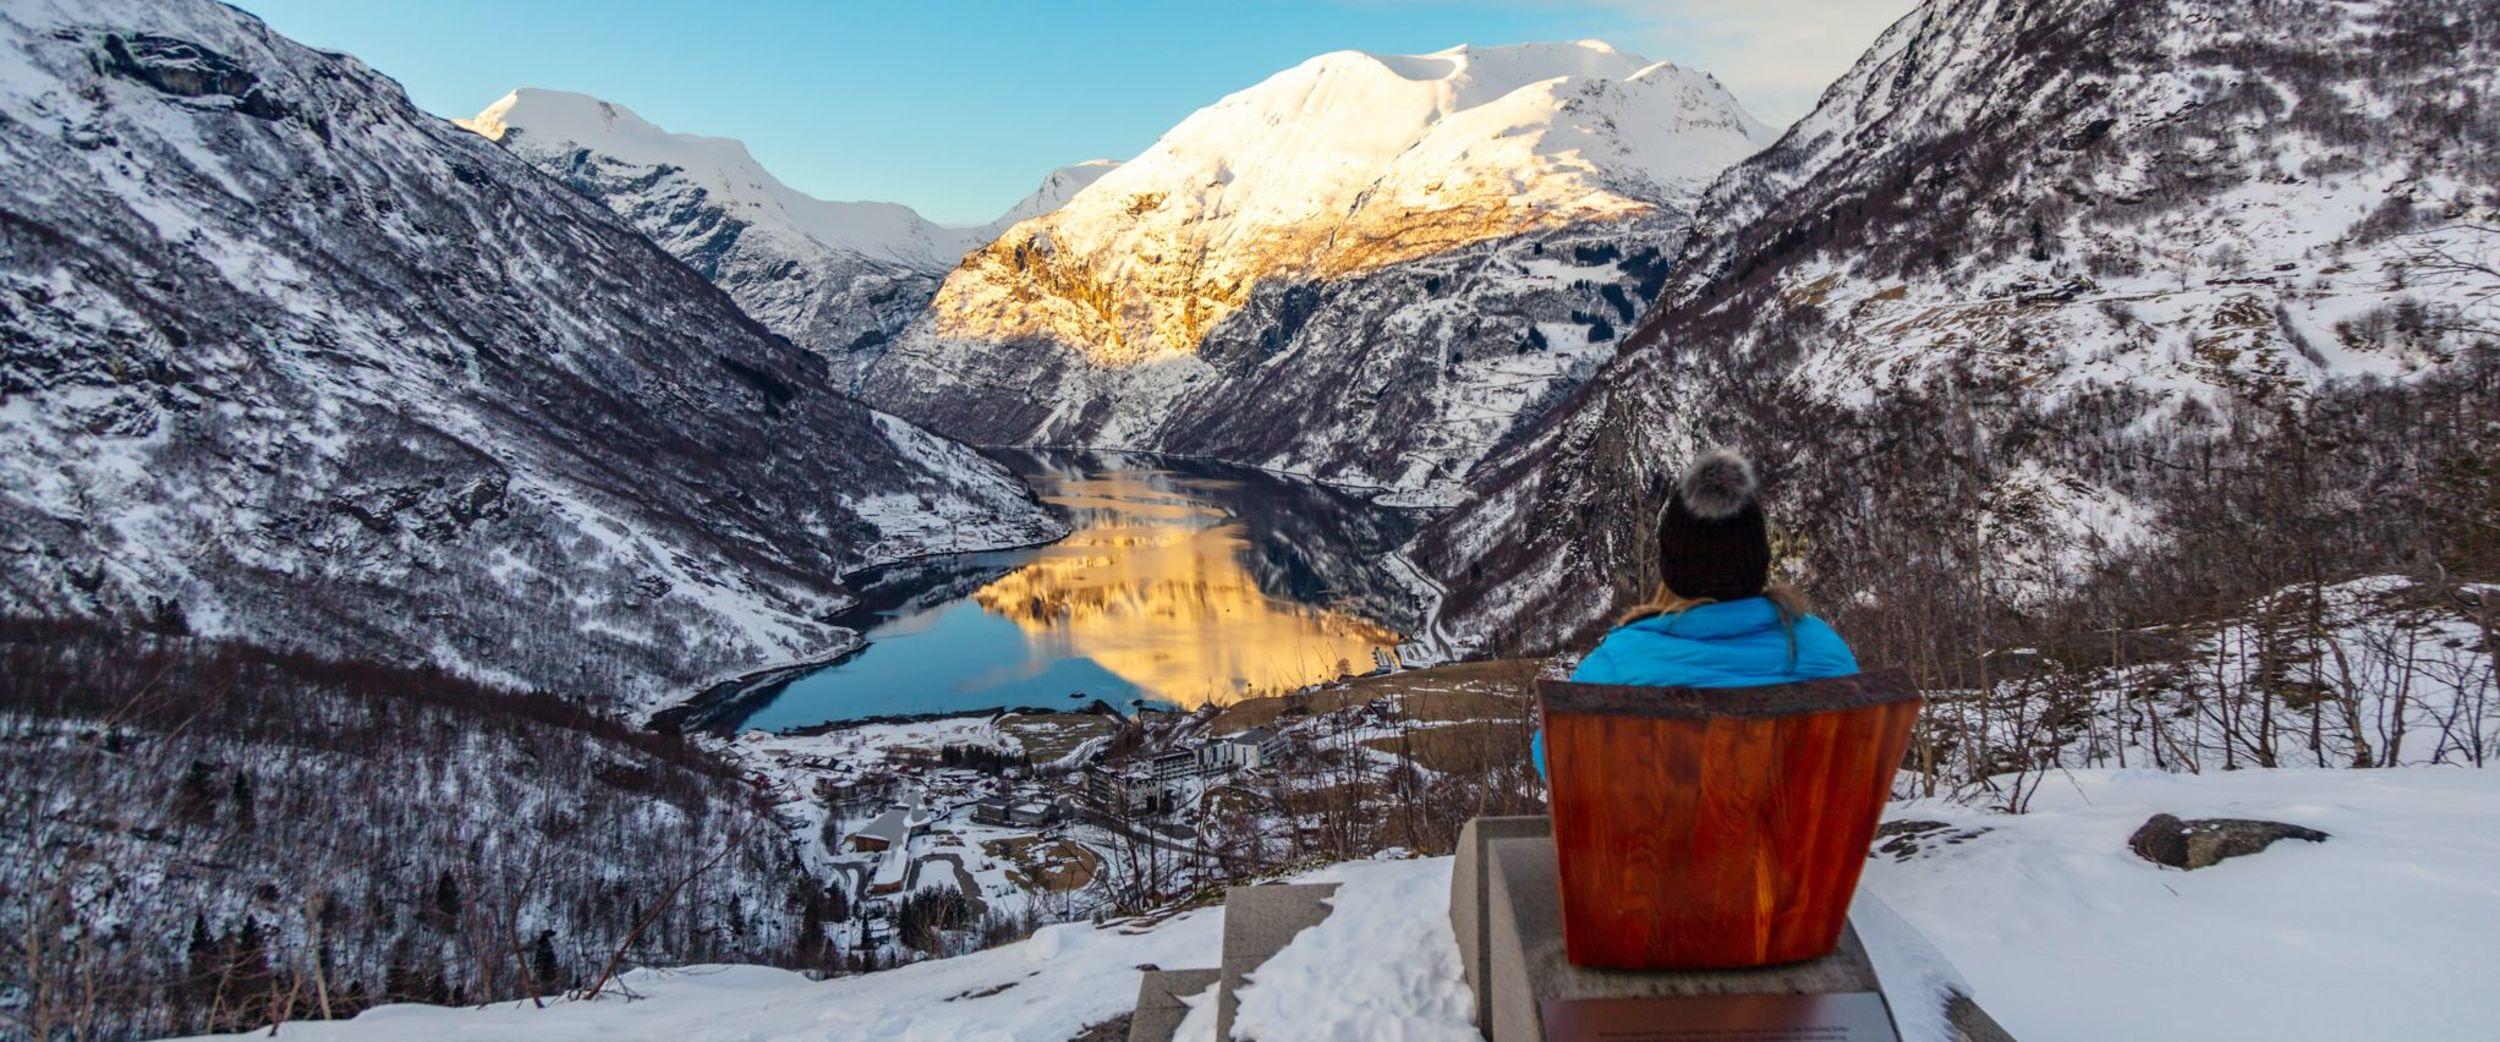 Beautiful view to Geirangerfjorden in the winter. Photo:Rune Hagen/Stiftinga Geirangerfjorden verdsarv